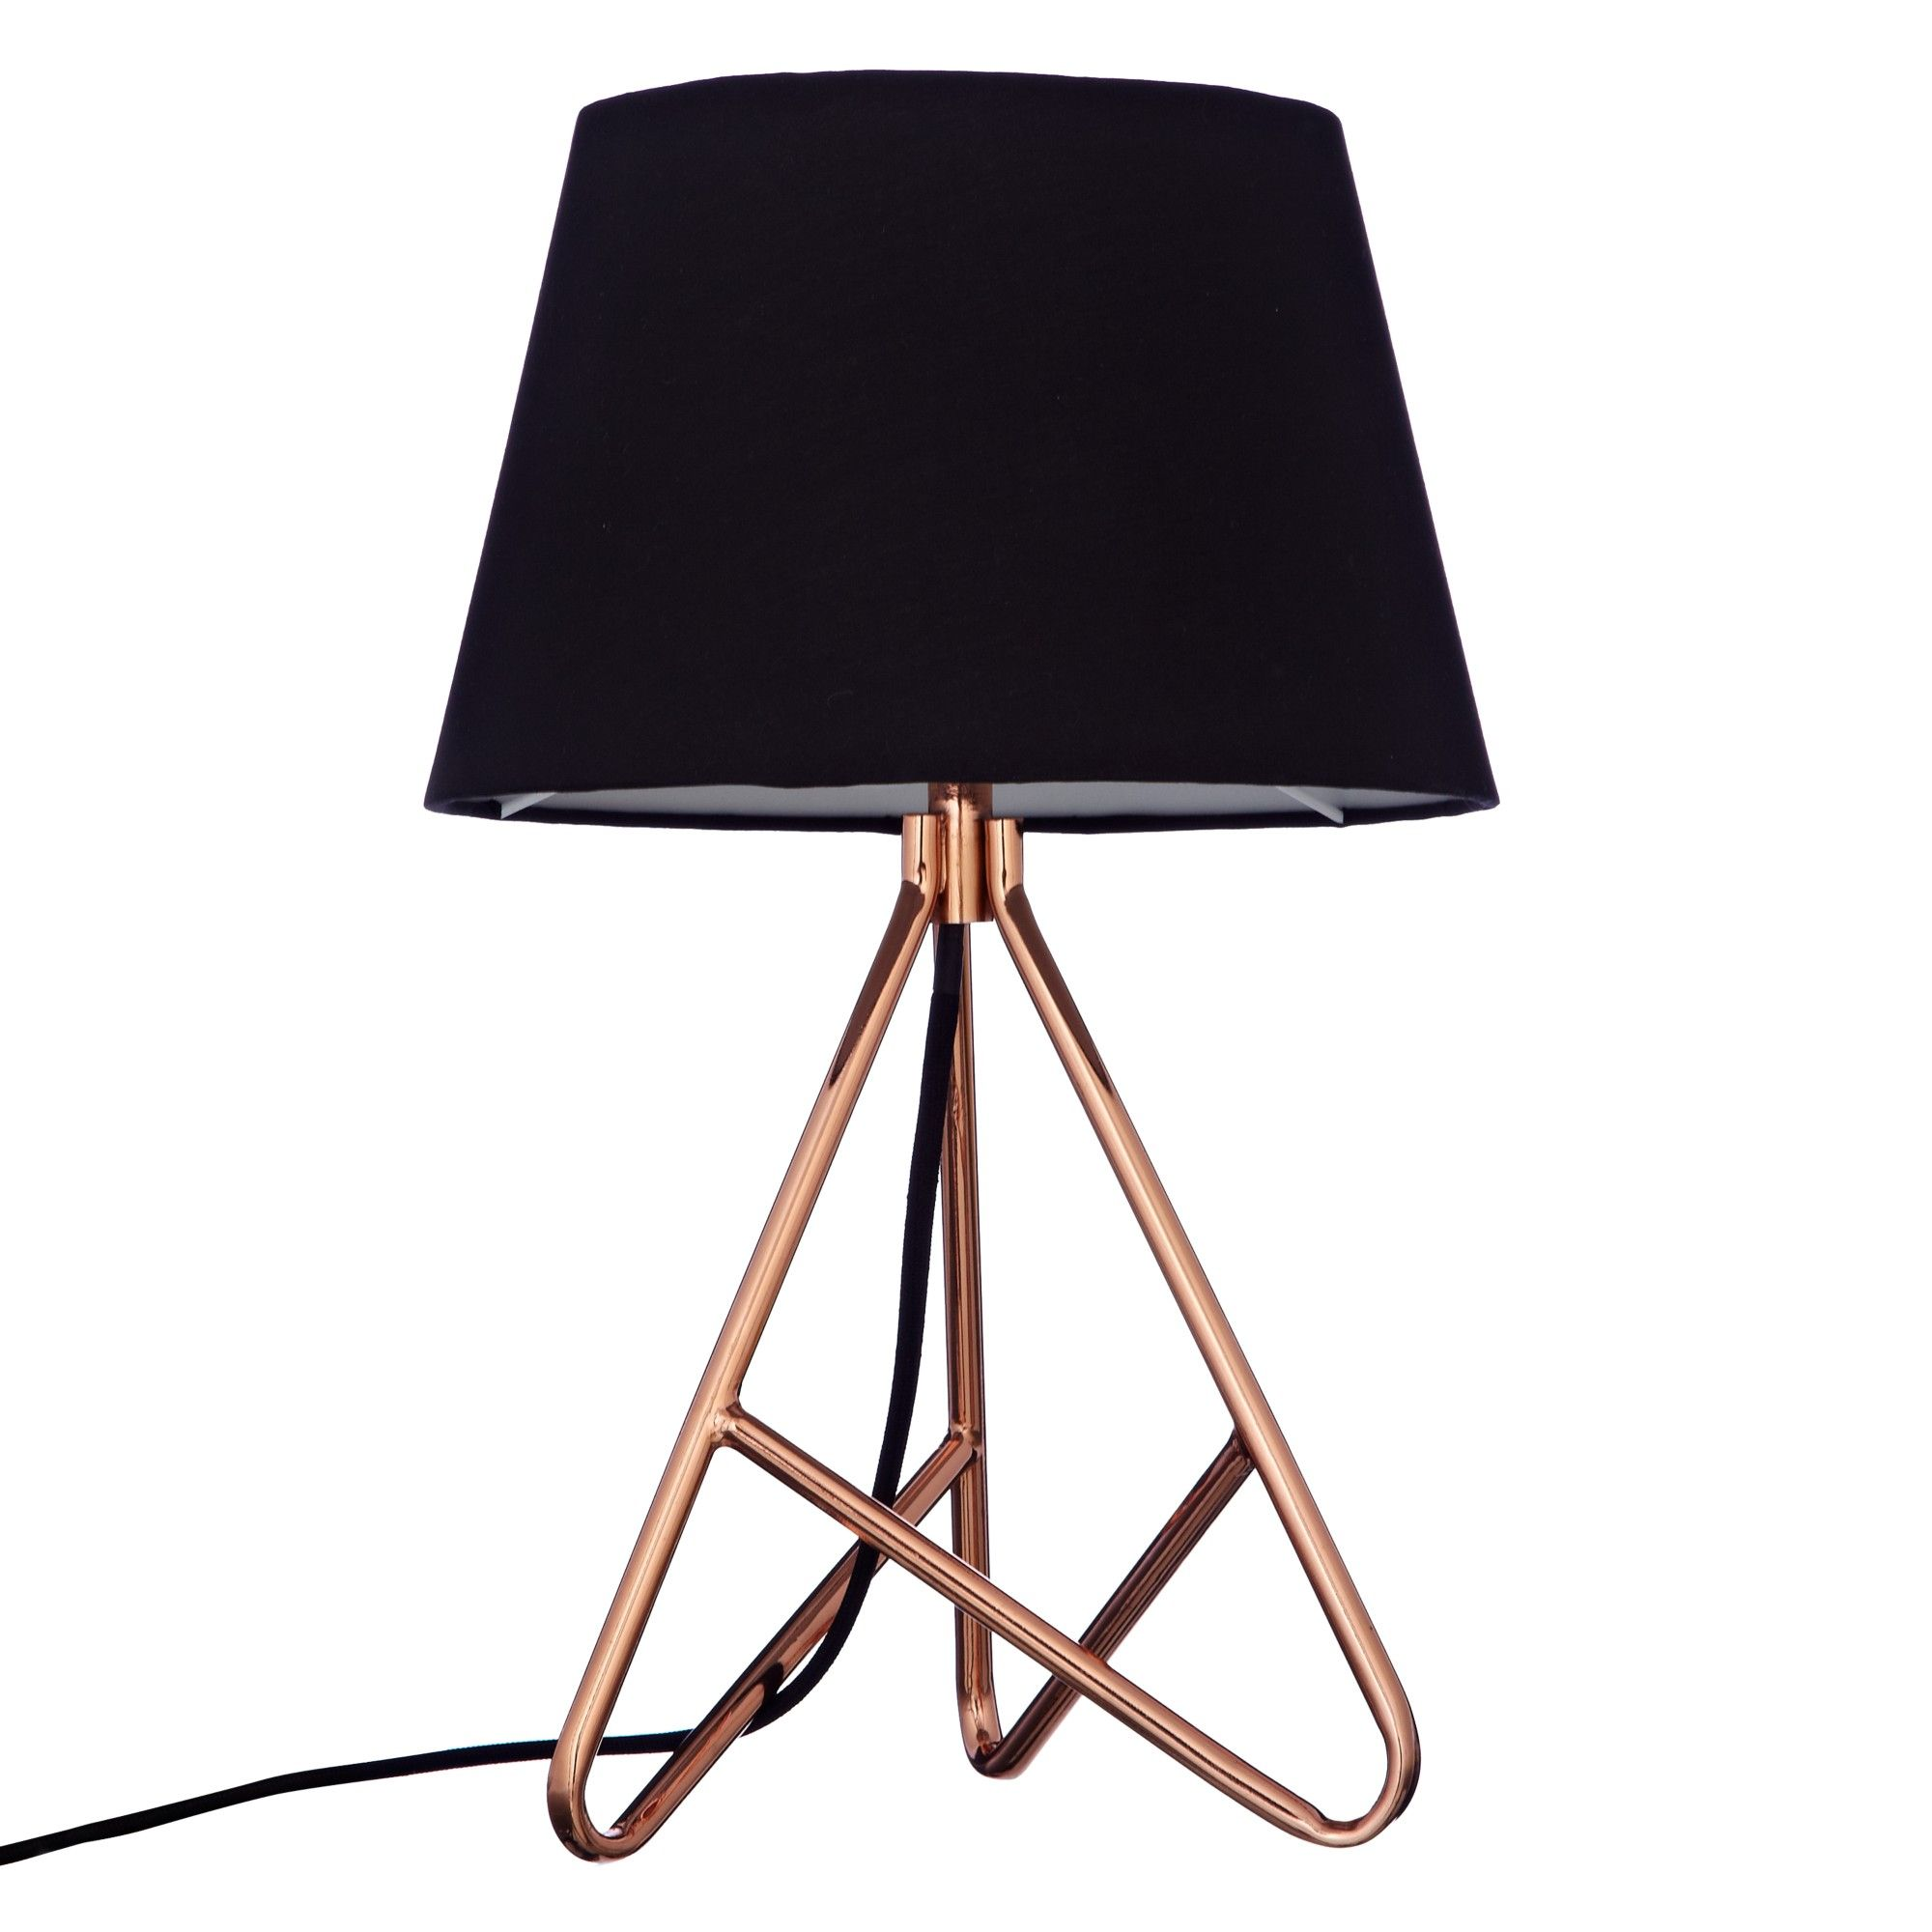 John lewis albus twisted table lamp black copper from john john lewis albus twisted table lamp black copper from john lewis 40 aloadofball Gallery